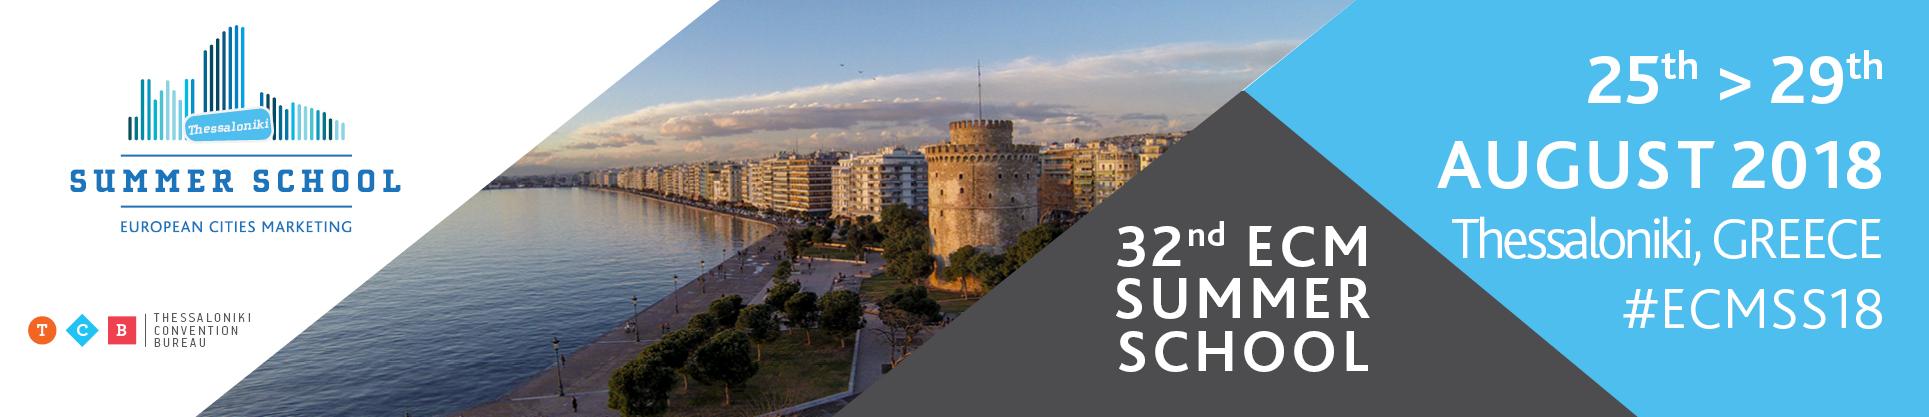 32nd ECM Summer School in Thessaloniki